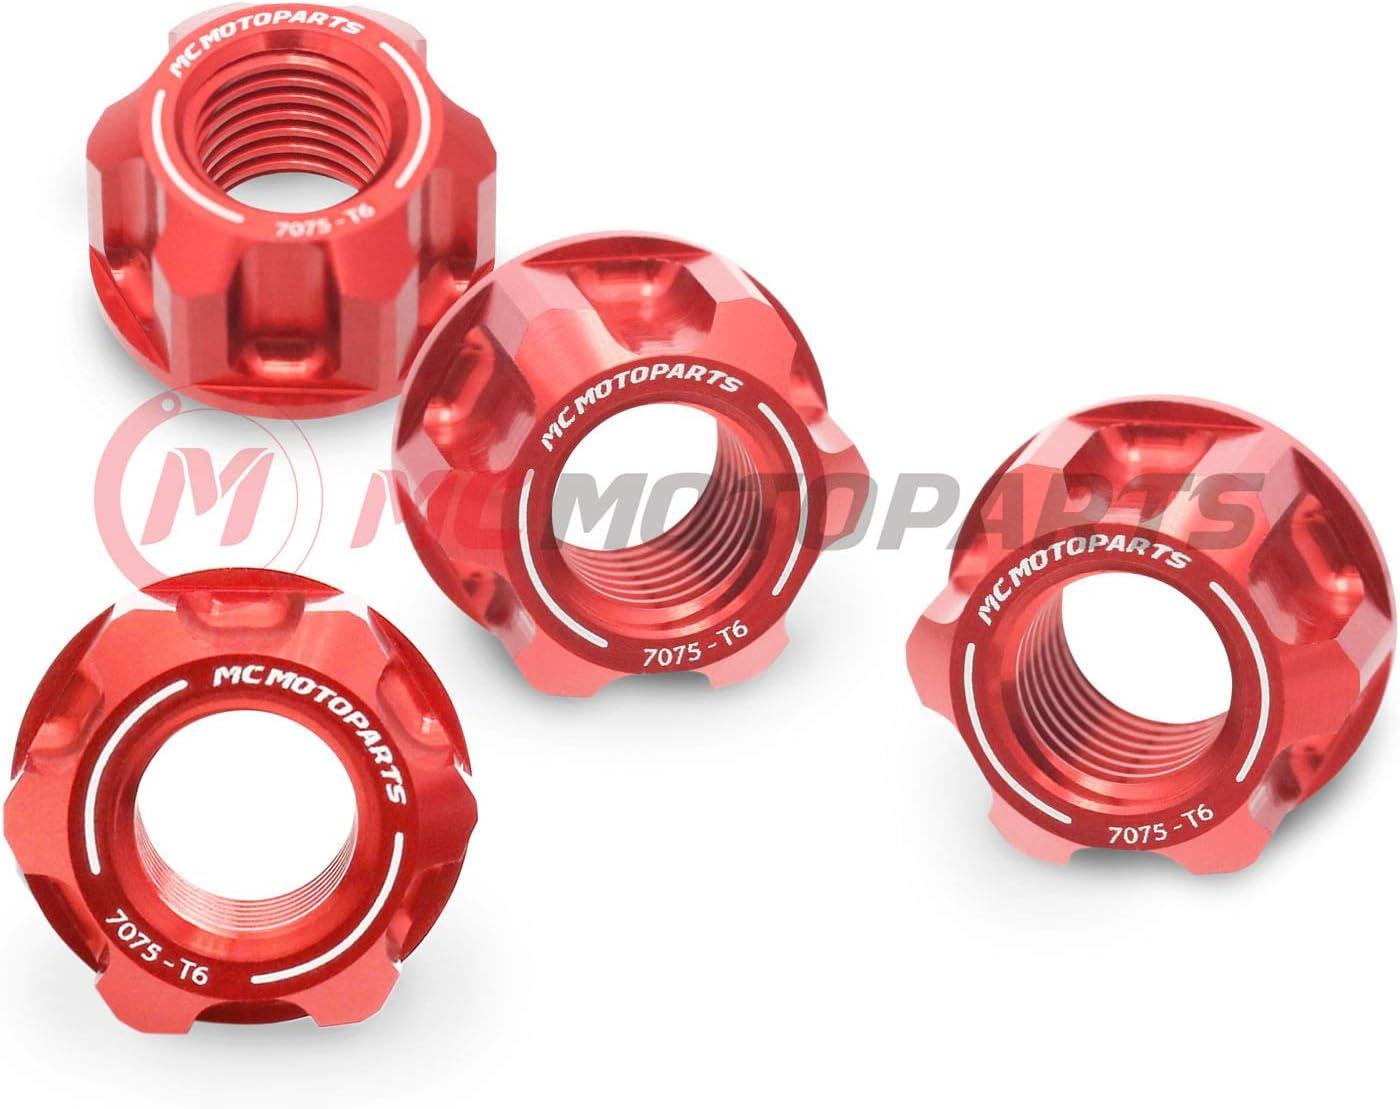 Grom 125 SF MC MOTOPARTS Red CNC Rear Sprocket Nuts For Honda MSX 125 GROM 2014-2020 Monkey 125 Z125MA 18 19 2020